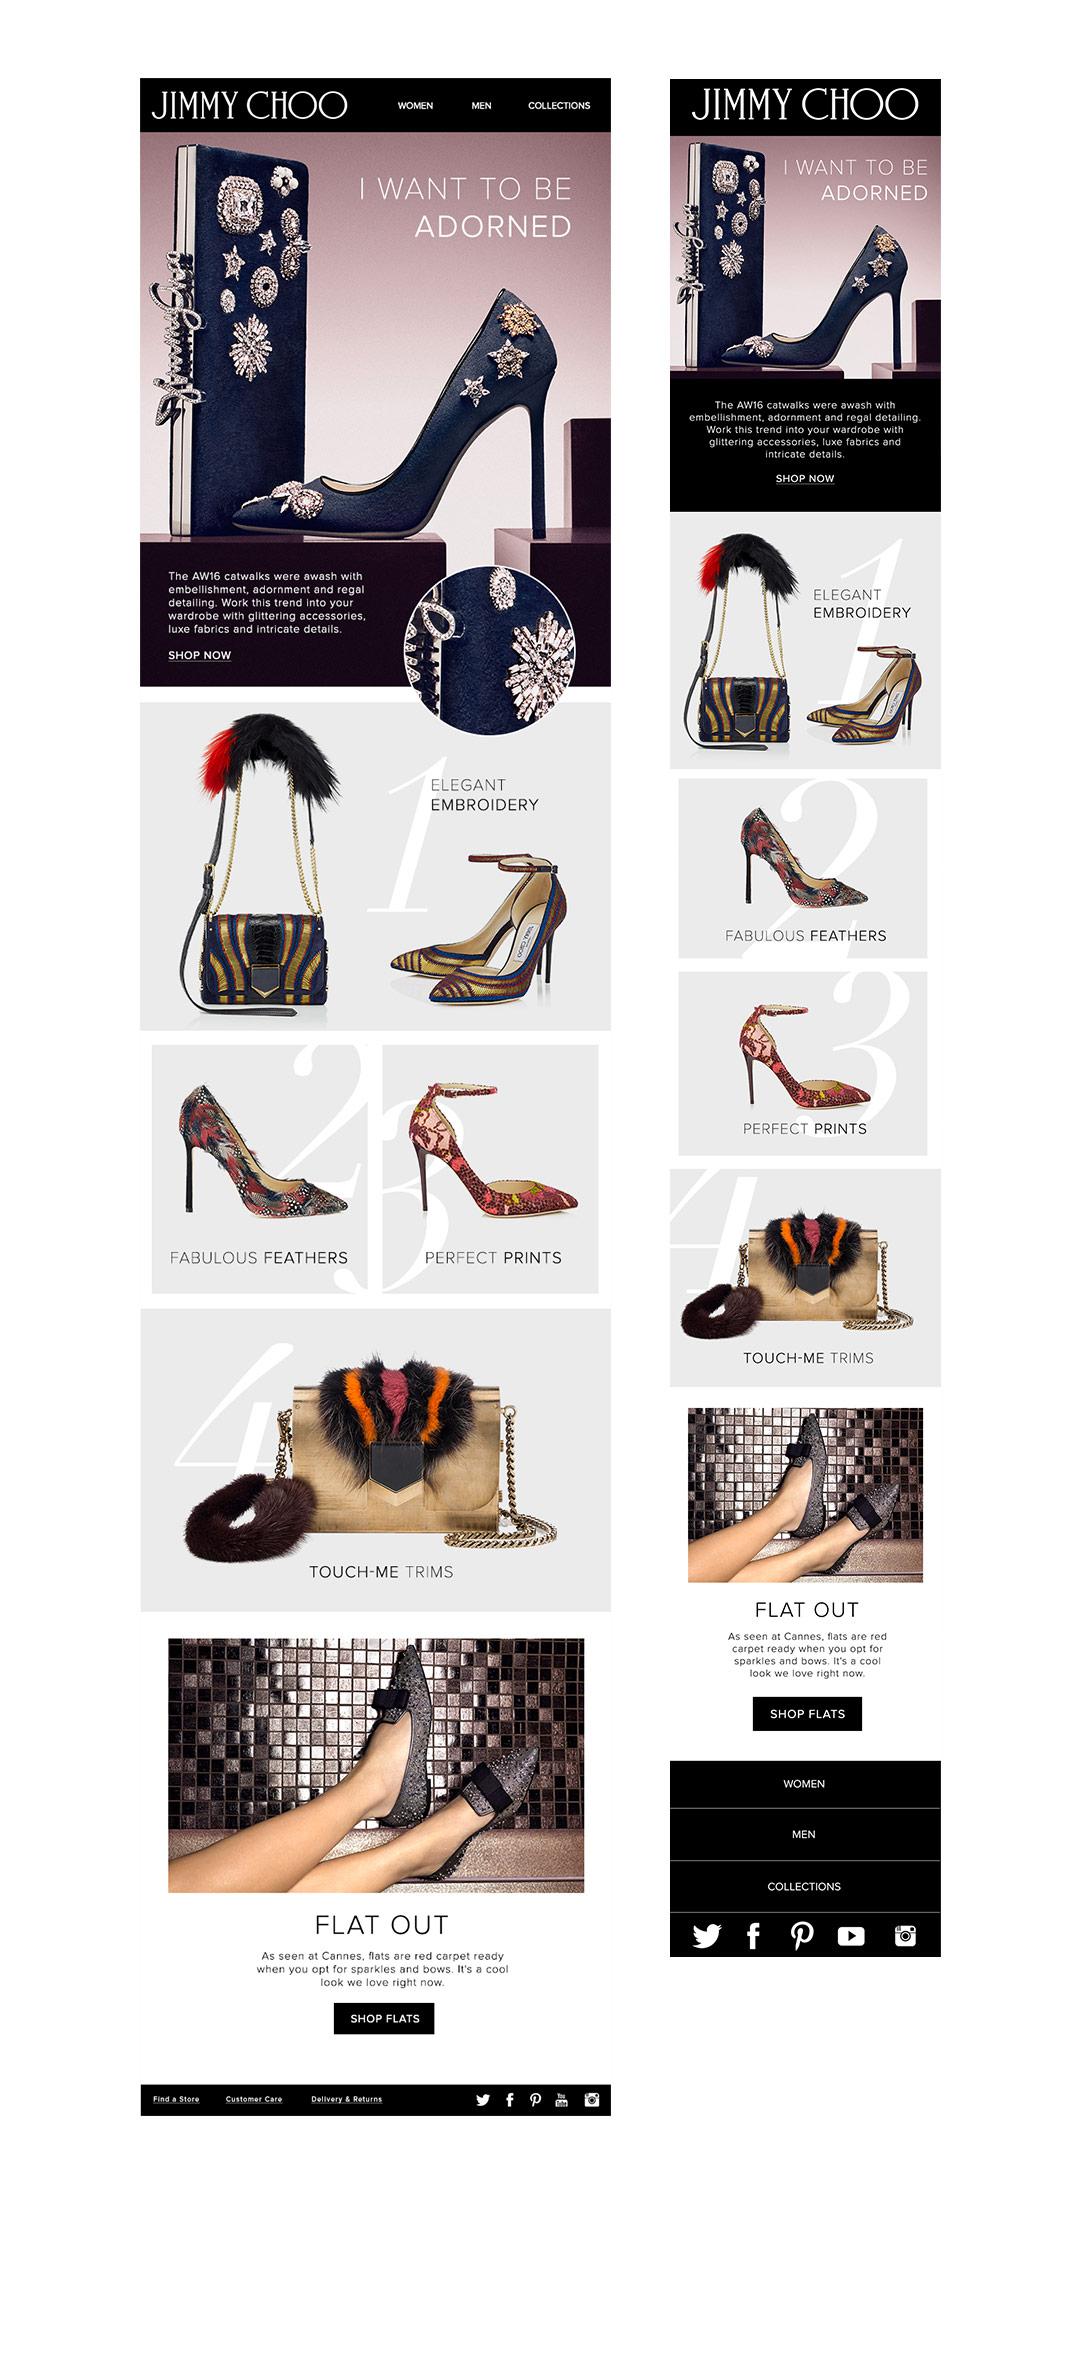 adoreddesigns-editorial-post-jimmy-choo